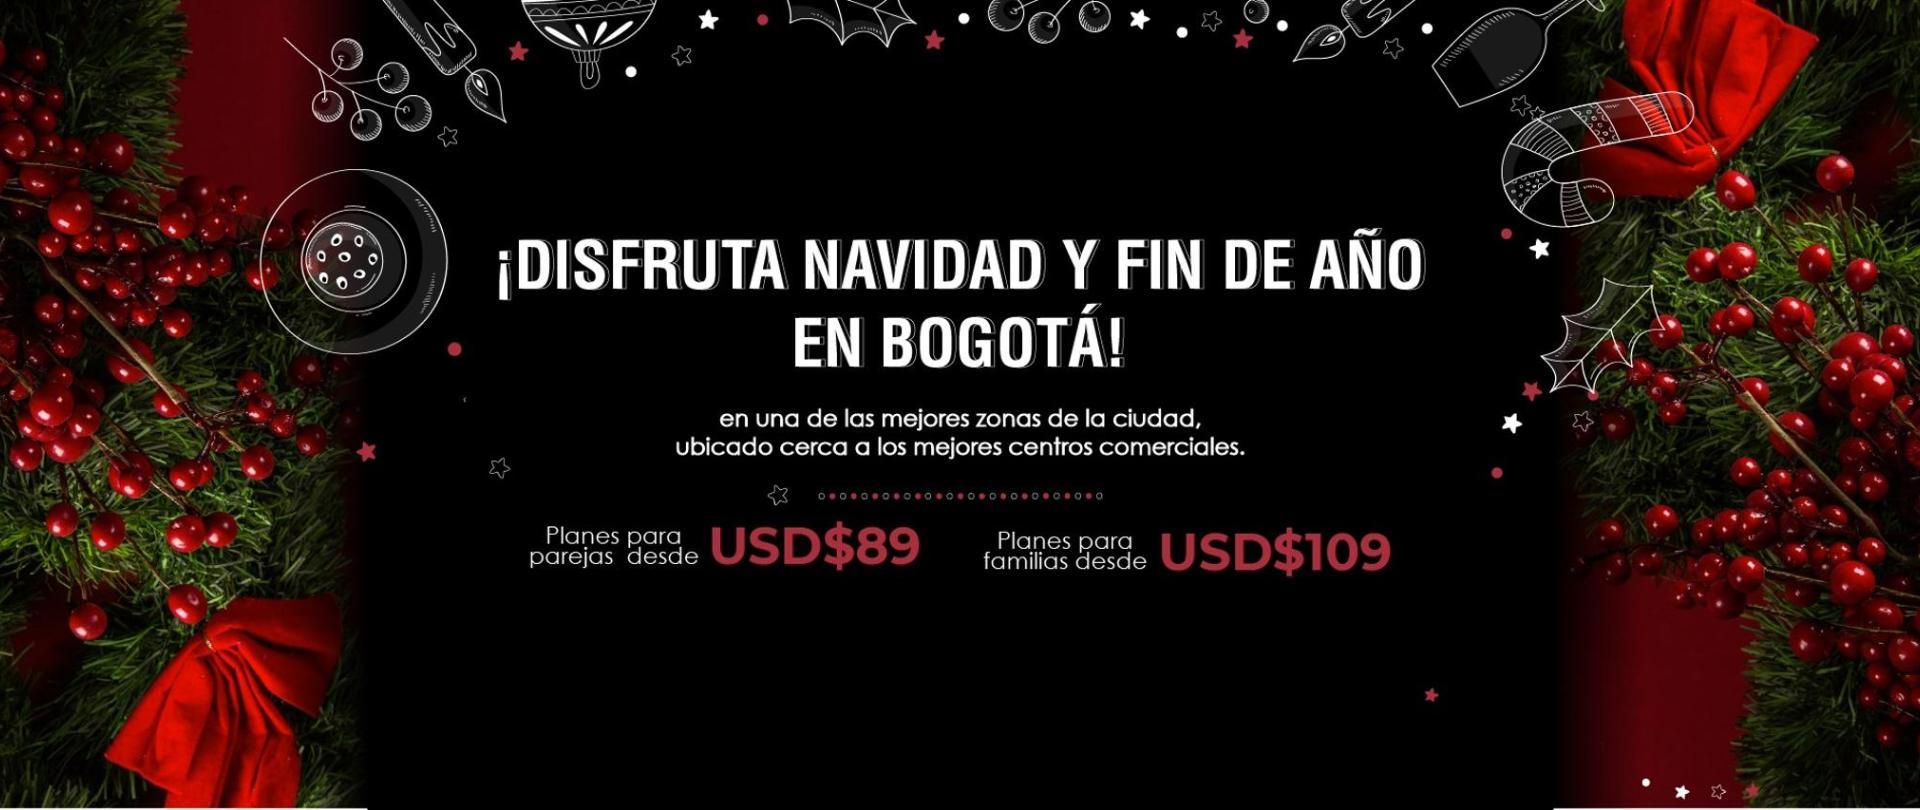 www.jazzapartments.com-navidad-2018-promocion.jpg